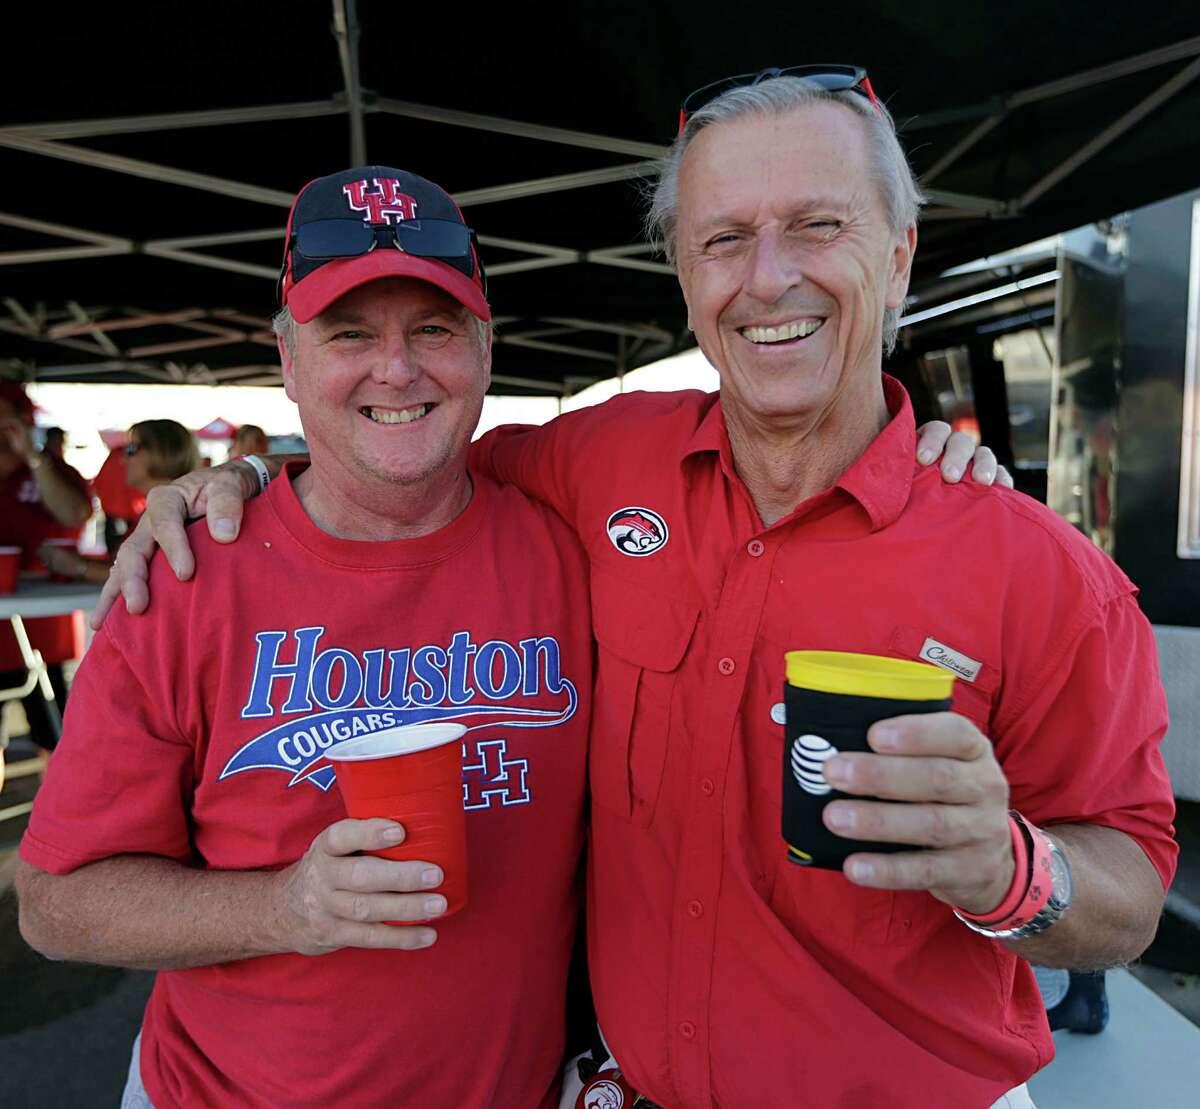 Seensters before the University of Houston, Louisville college football game at TDECU Stadium Nov. 17, 2016, in Houston.